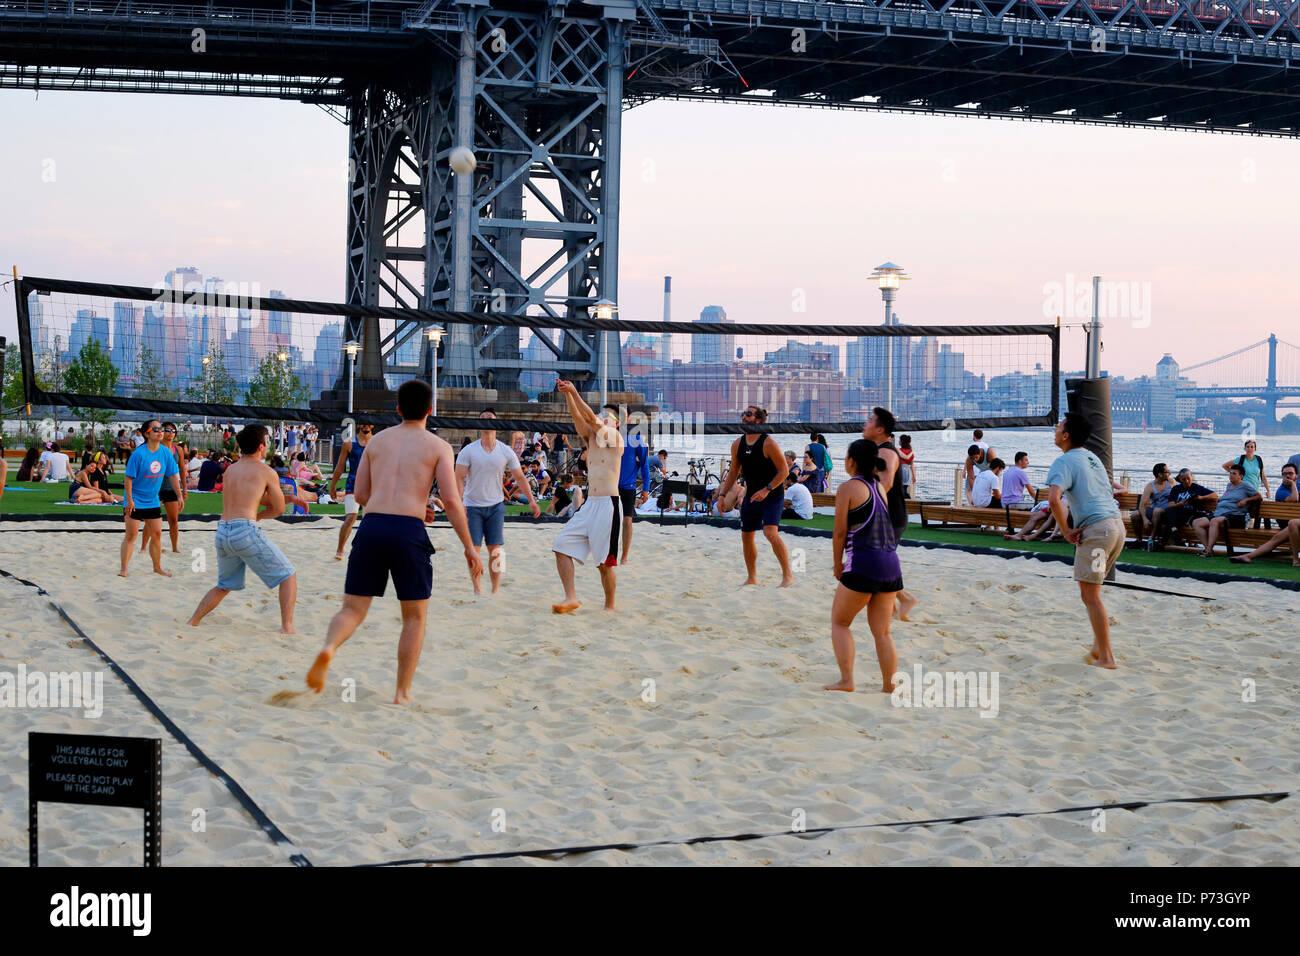 Beach volleyball at Domino Park in Williamsburg, Brooklyn, NY - Stock Image